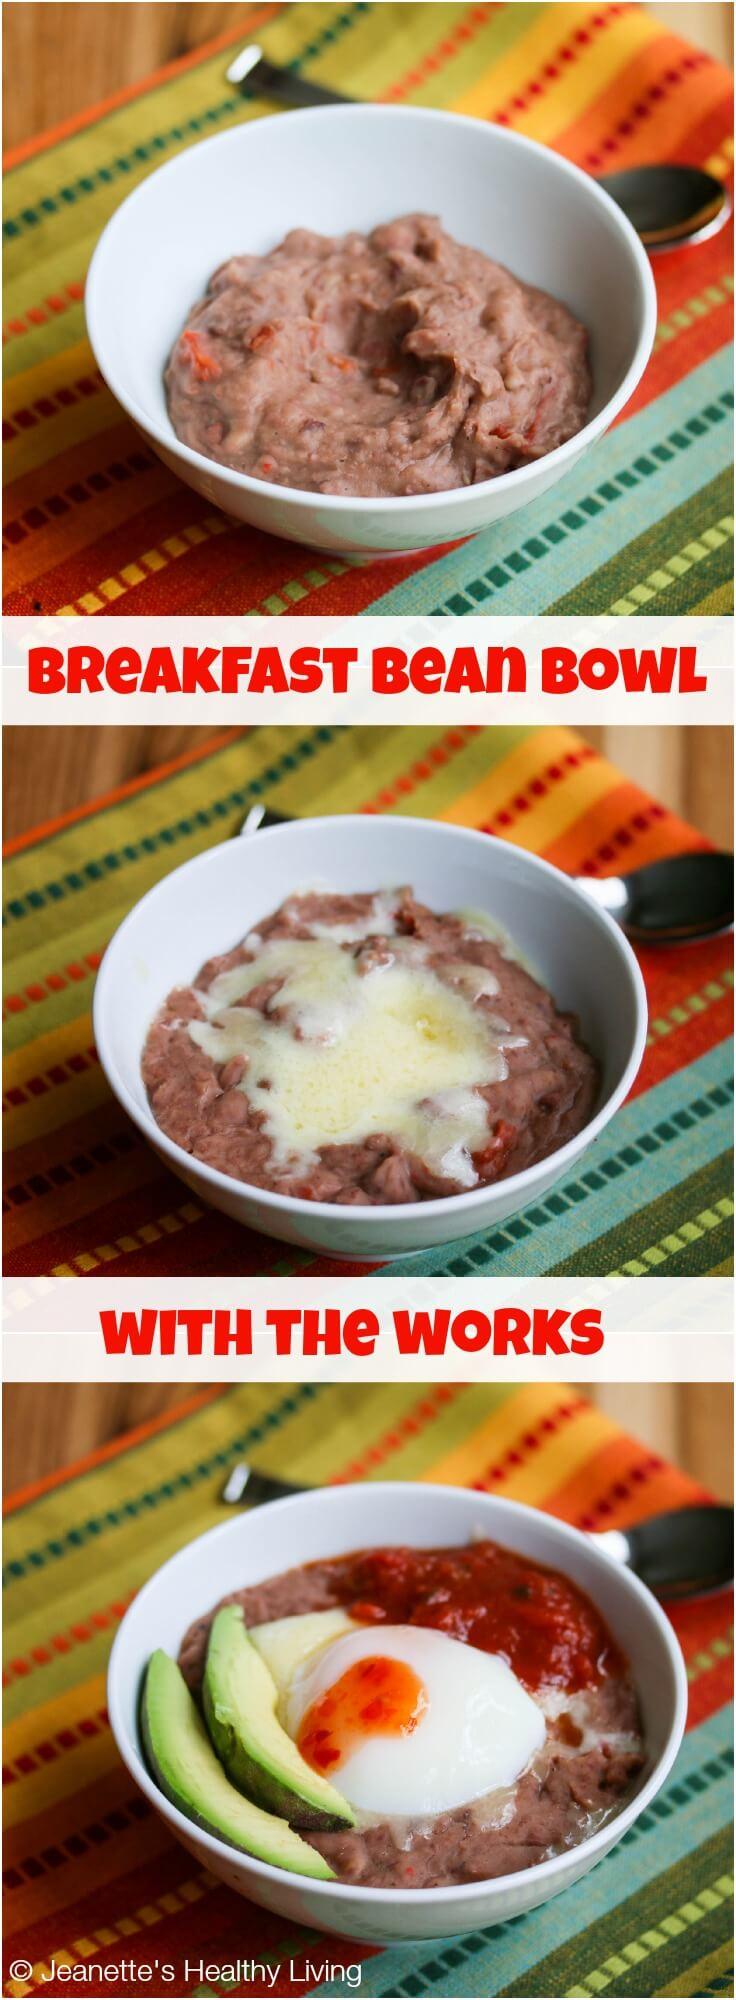 Breakfast Refried Bean Bowl © Jeanette's Healthy Living